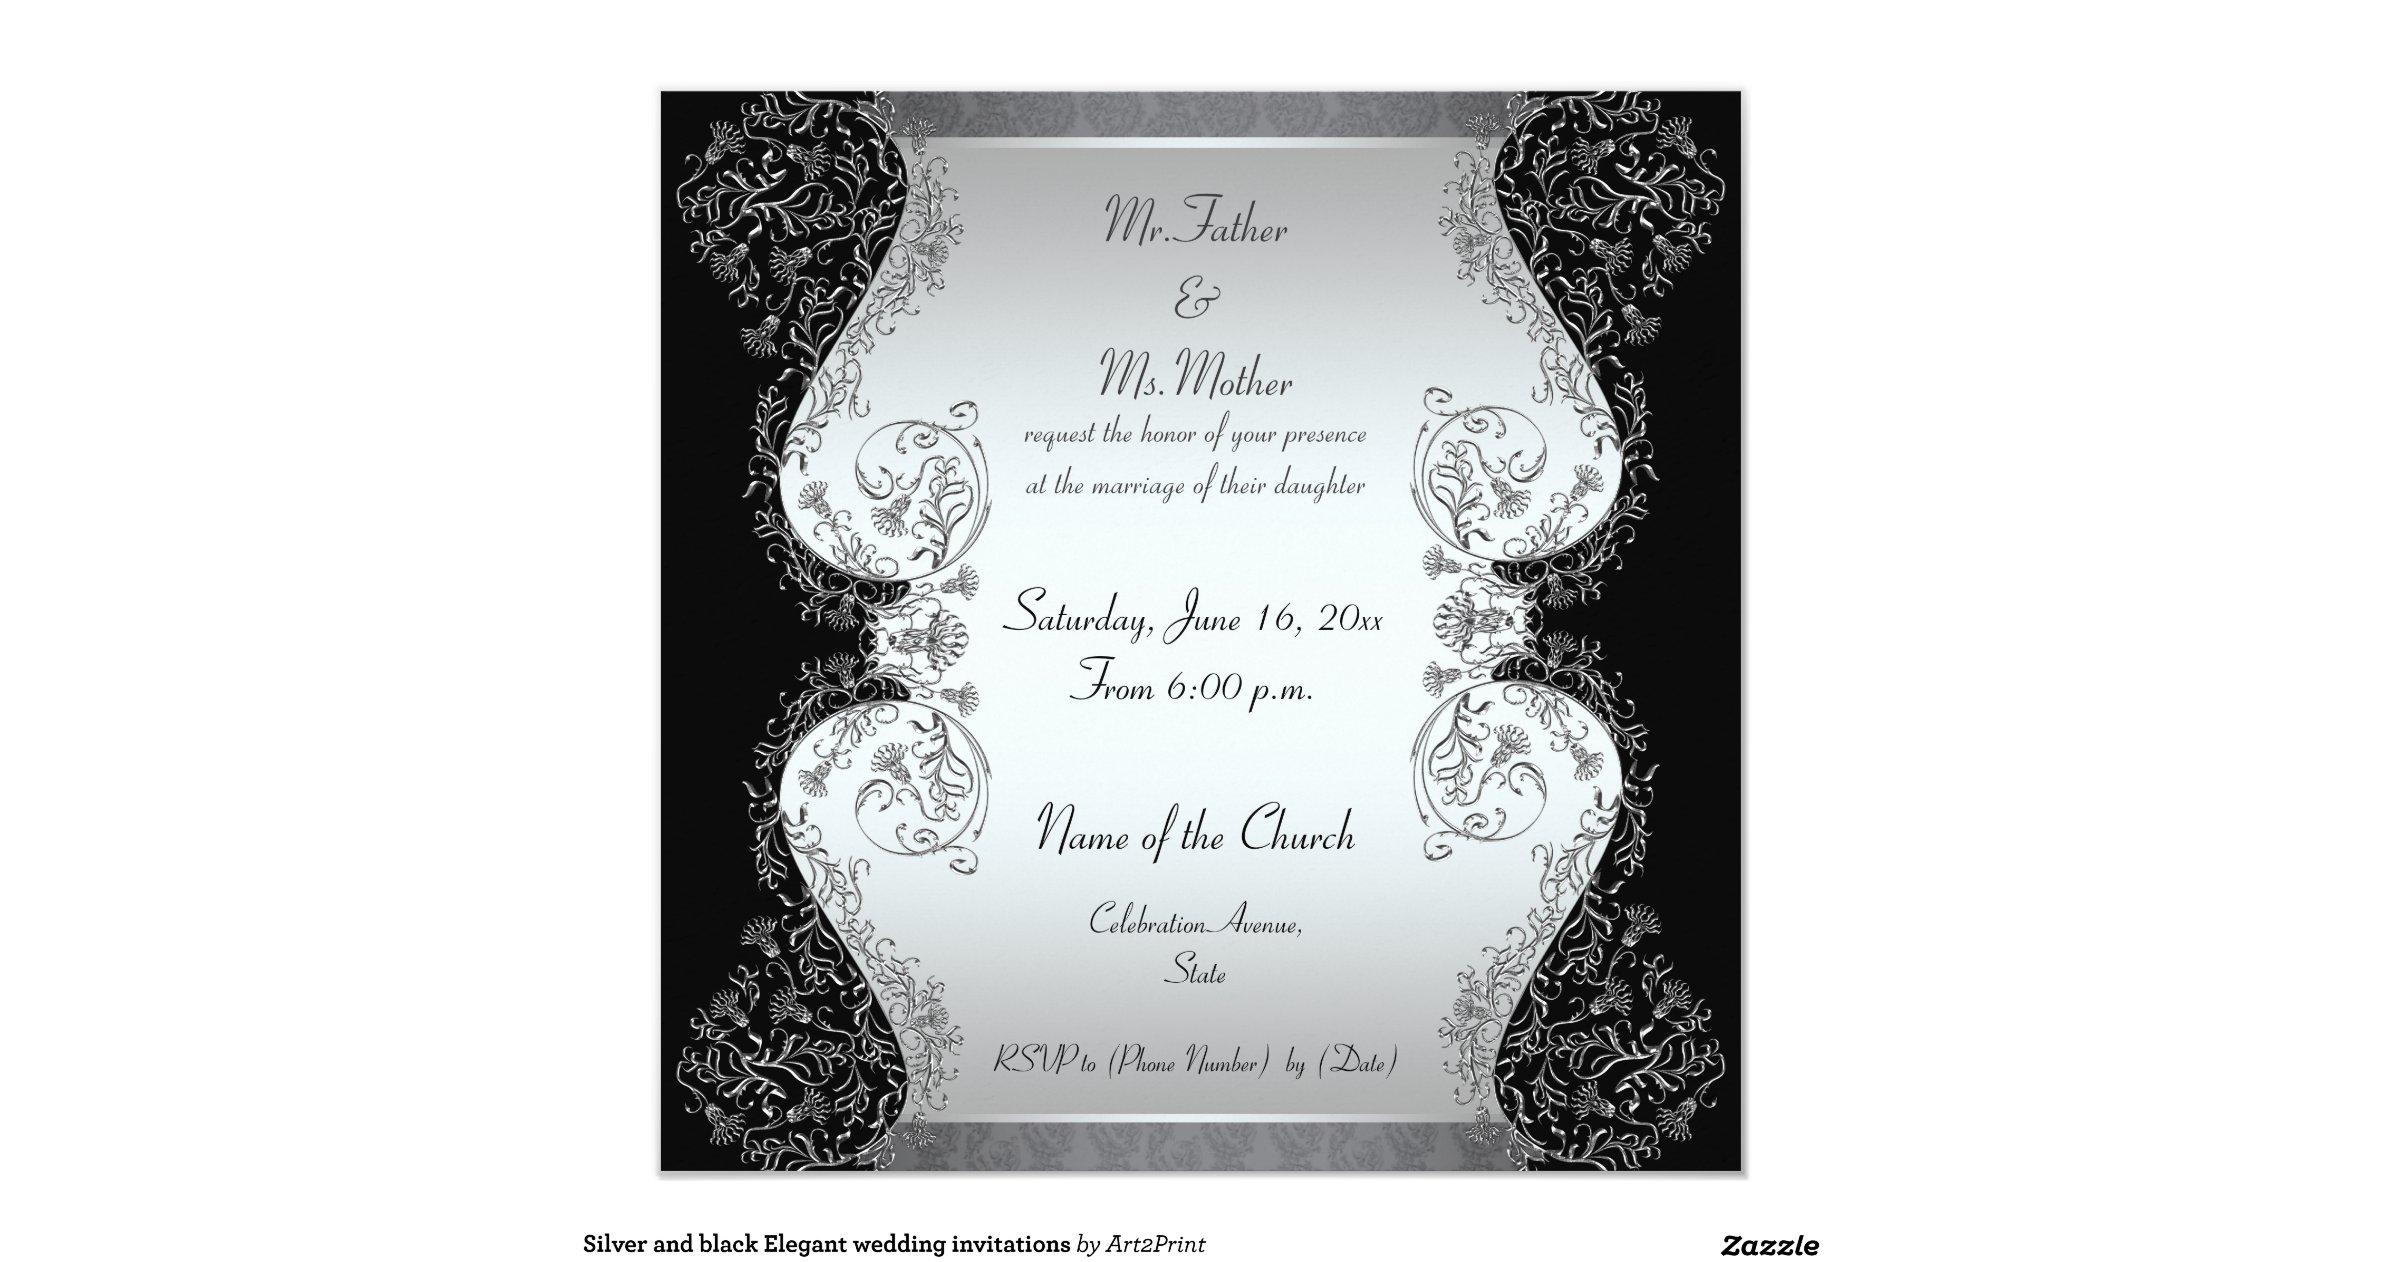 Black And Silver Wedding Invitations: Silver_and_black_elegant_wedding_invitations